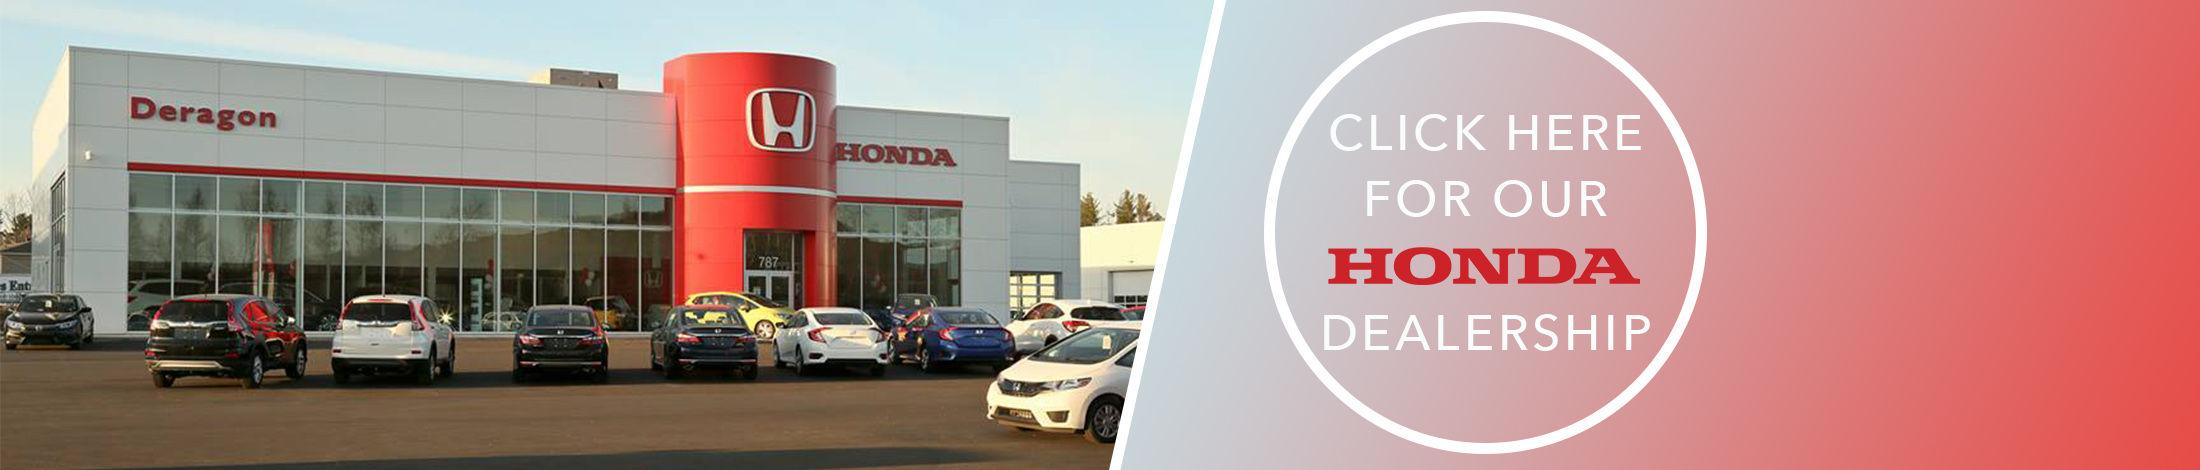 Our Honda dealership